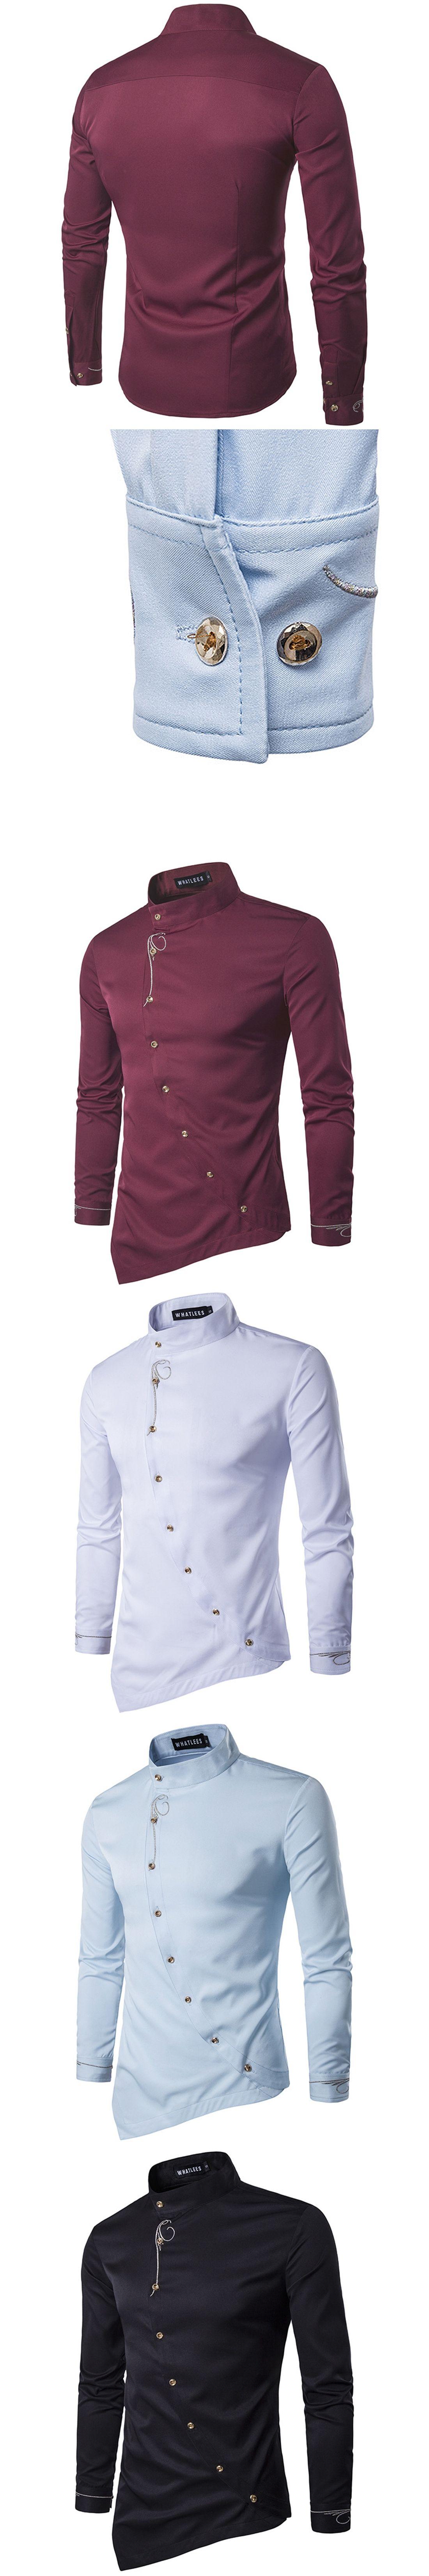 c0e45457359 Button Up Irregular Mens Shirts Stand Collar Long Sleeve Solid Party  Wedding Tuxedo Shirt 2017 Black